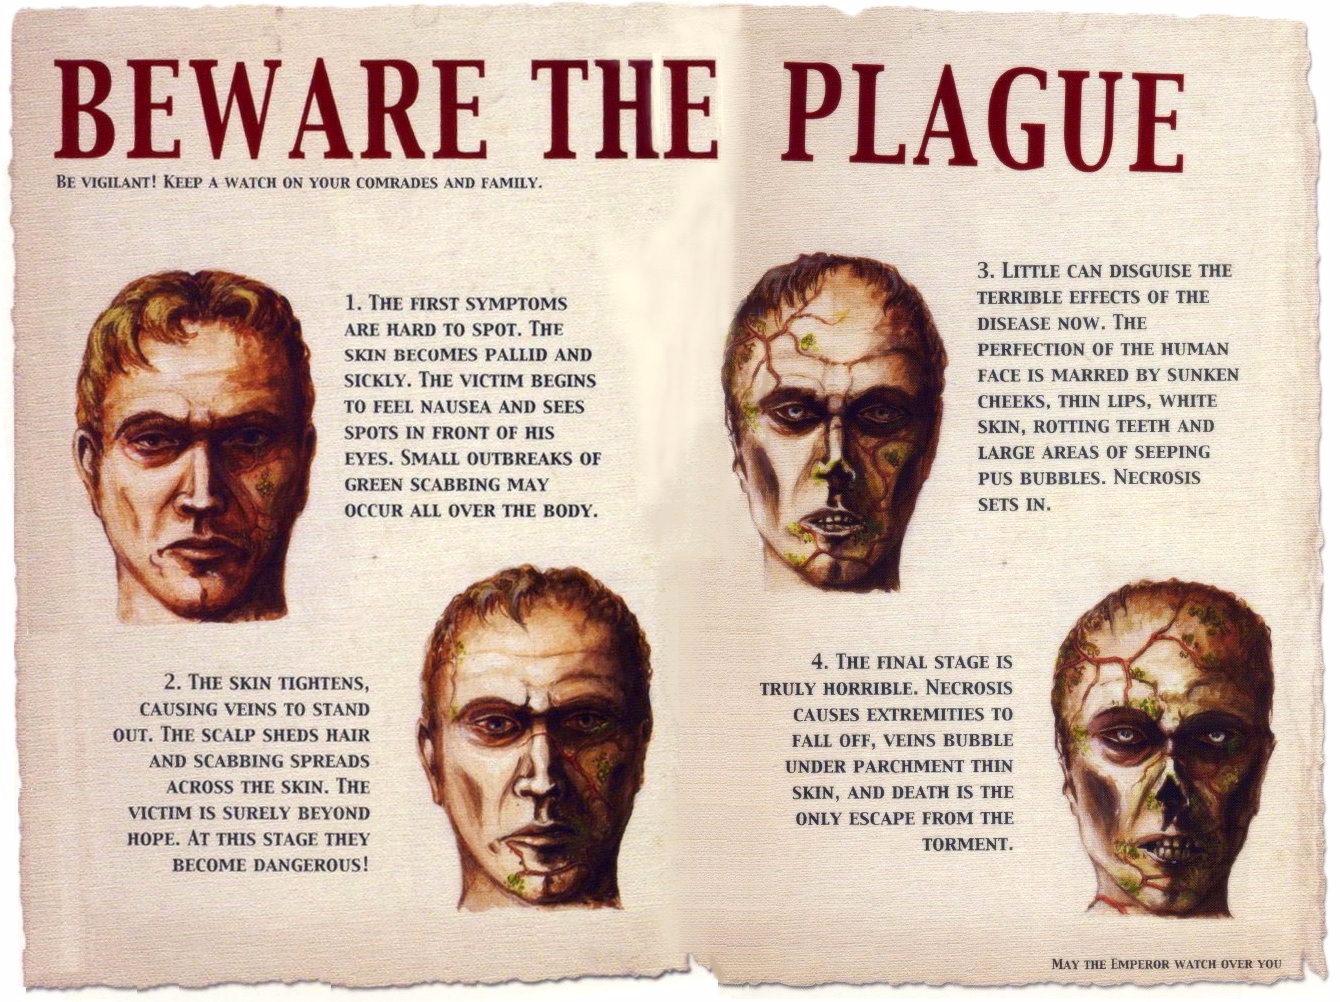 Beware the plague